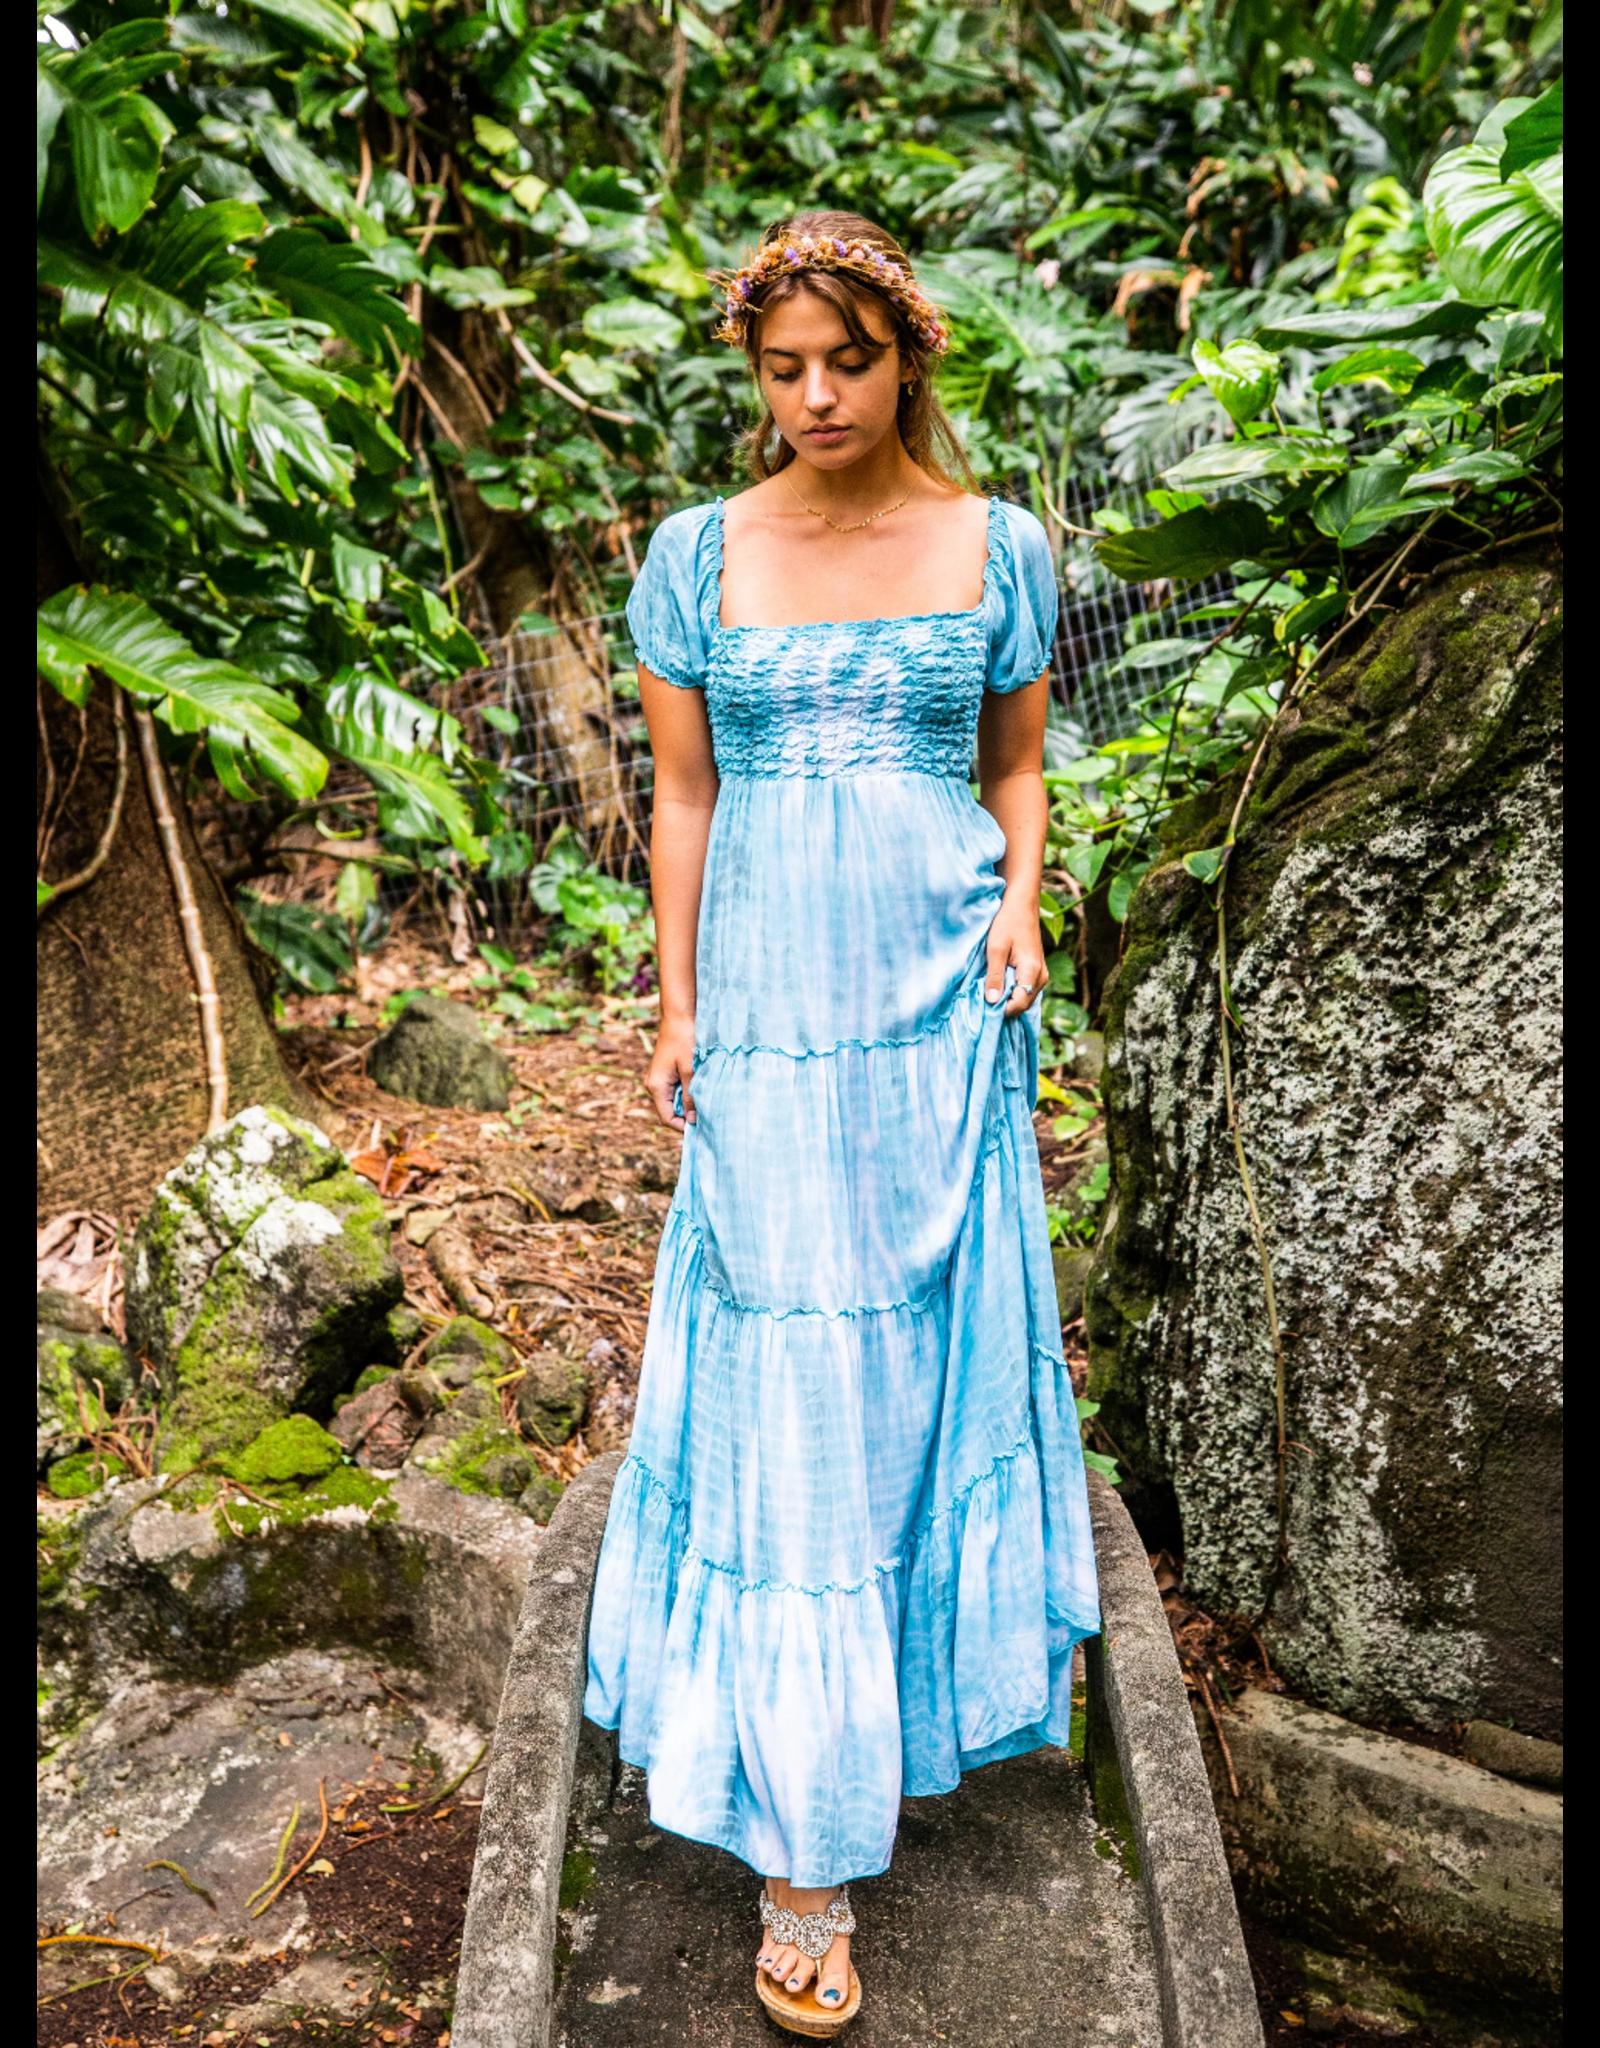 Waikiki Blue Romantic Dress